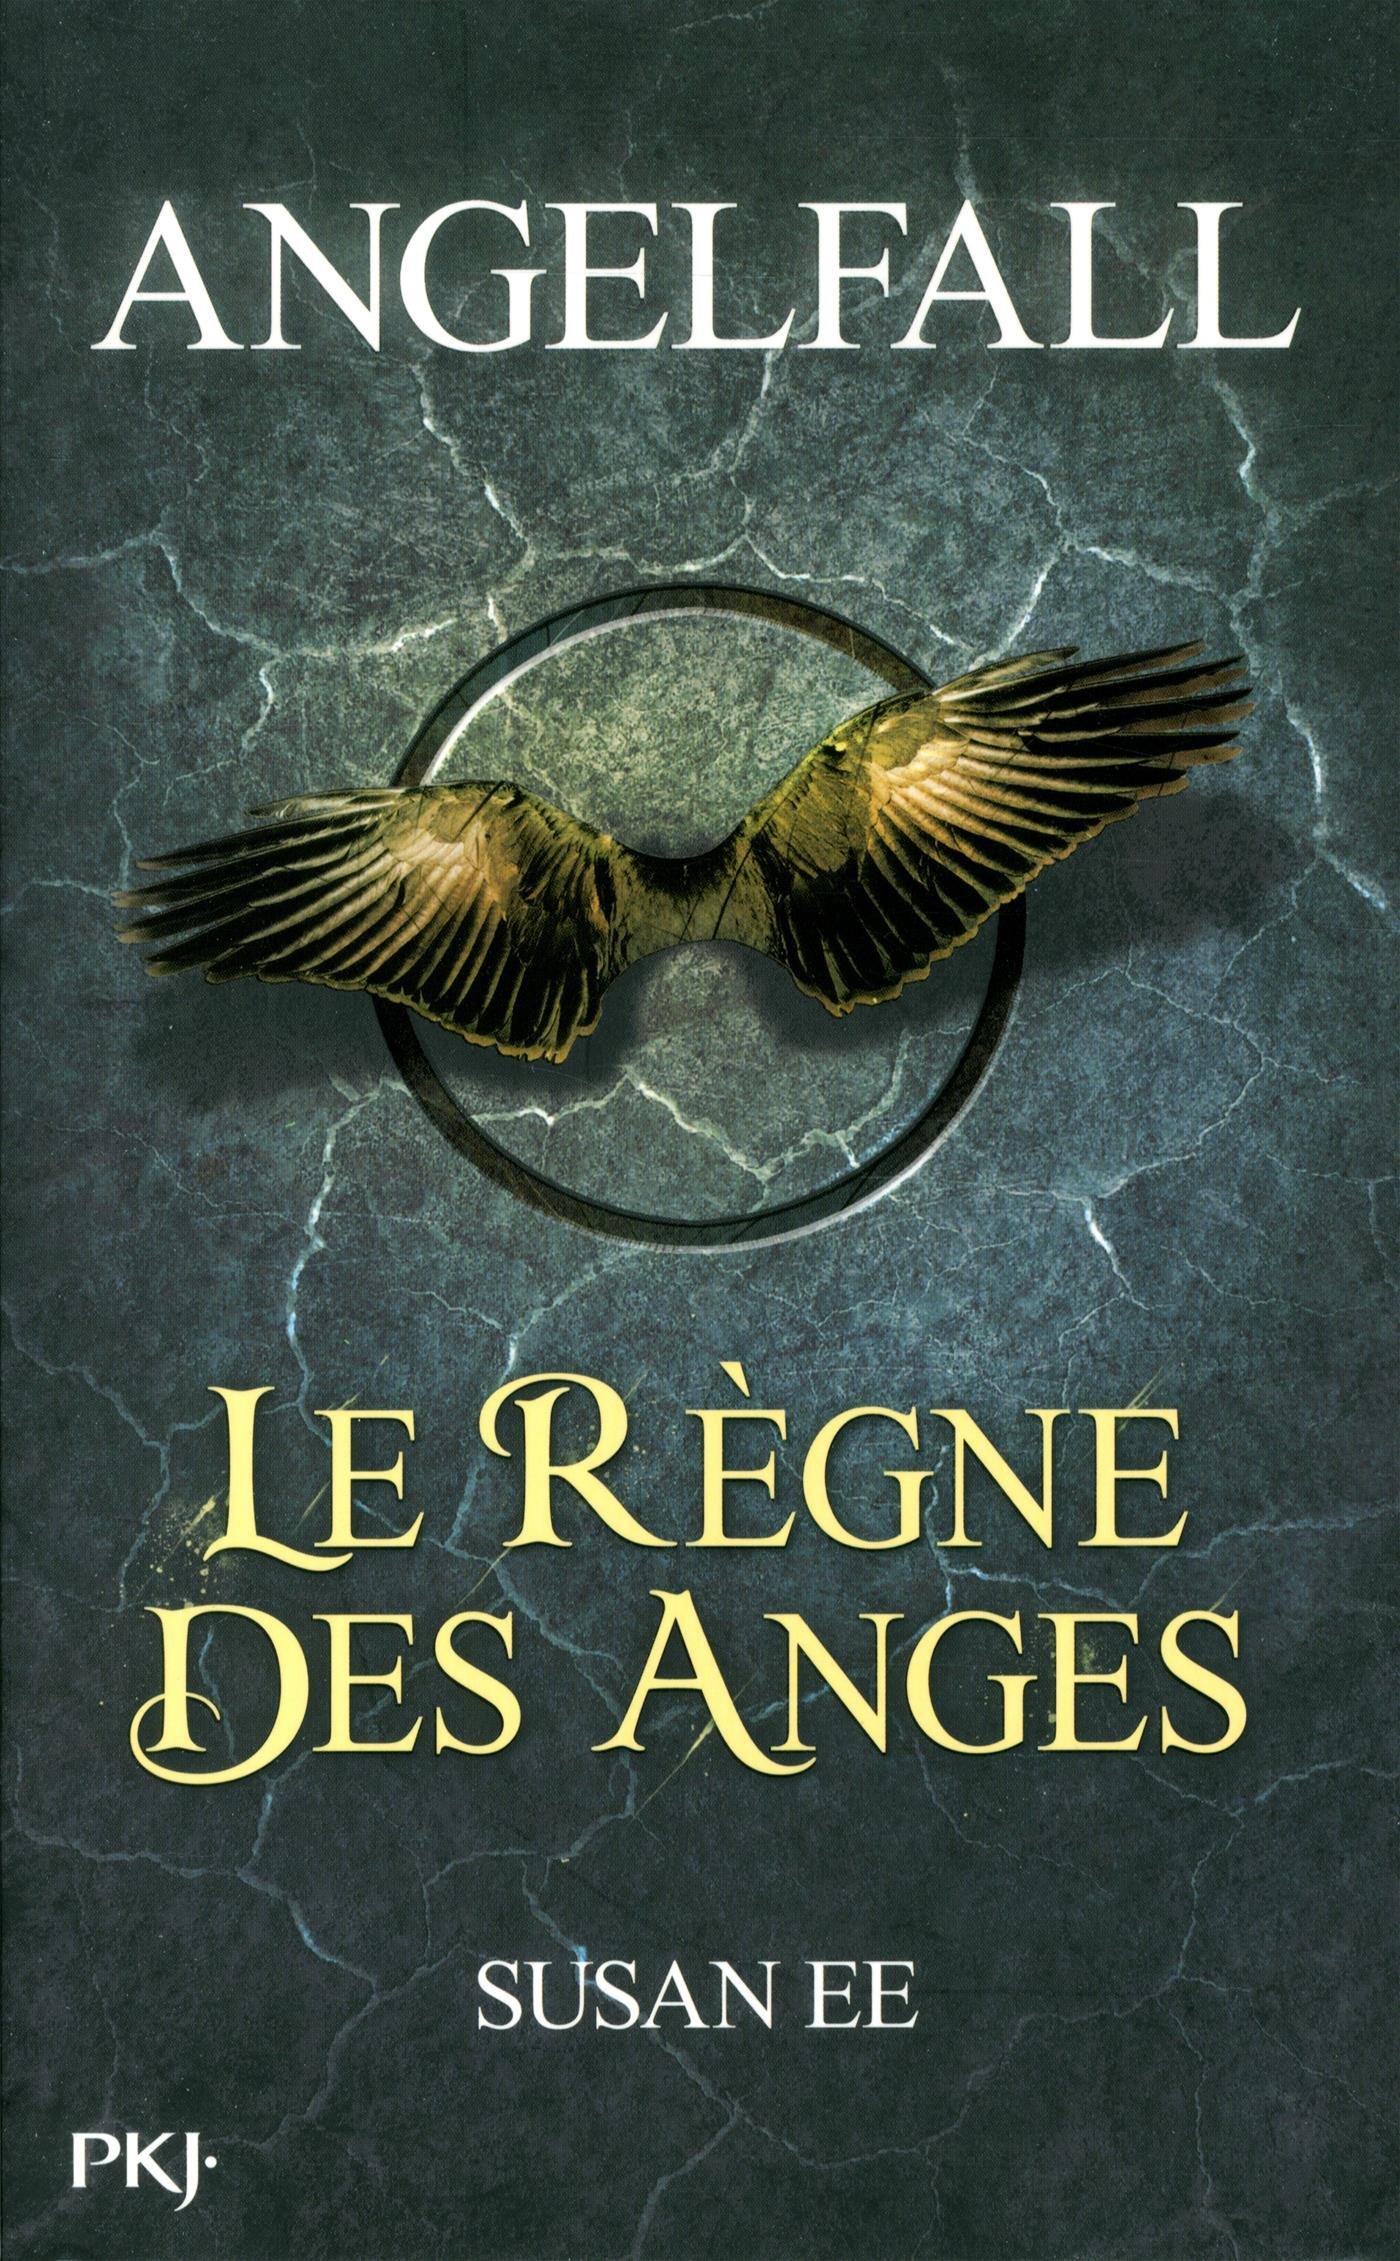 Angelfall, Tome 2 : Le règne des anges: Amazon.co.uk: Susan Ee, Alexandra  Maillard: 9782266257541: Books